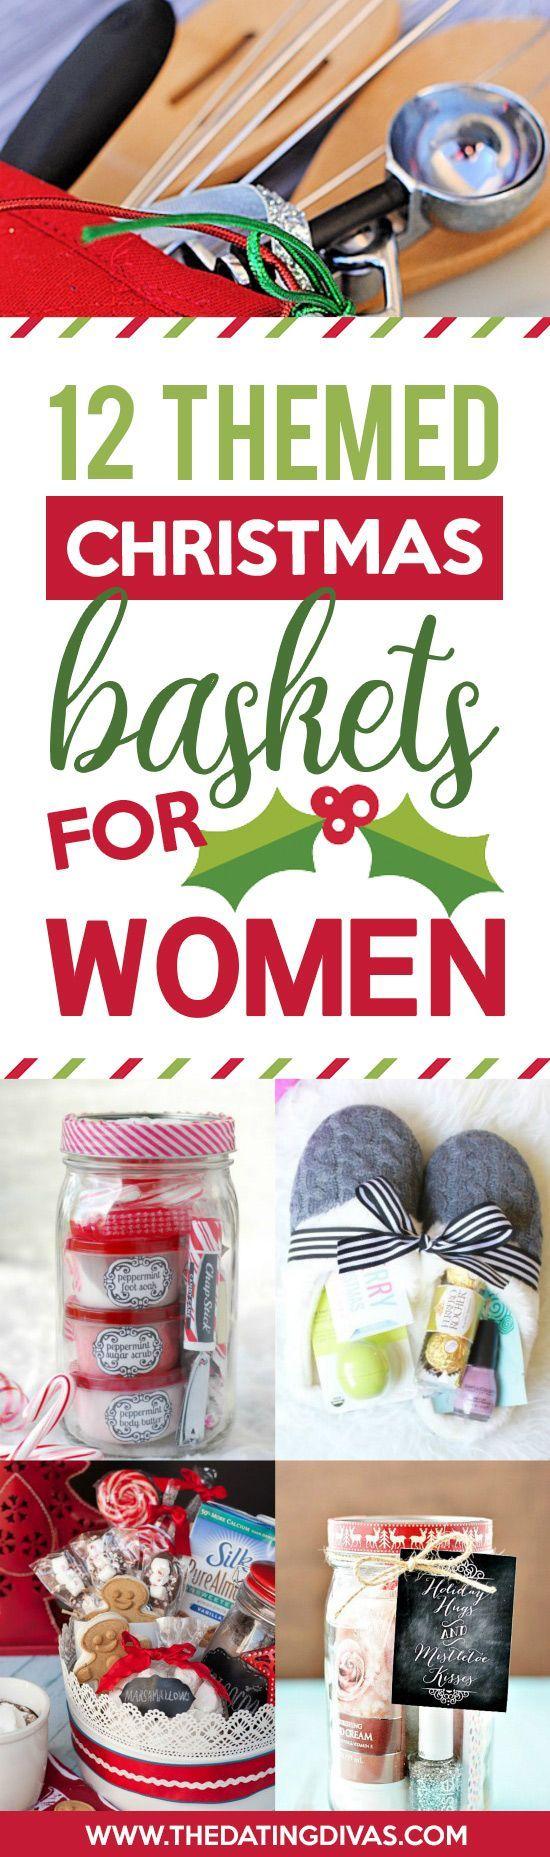 Christmas Gift Baskets for Women